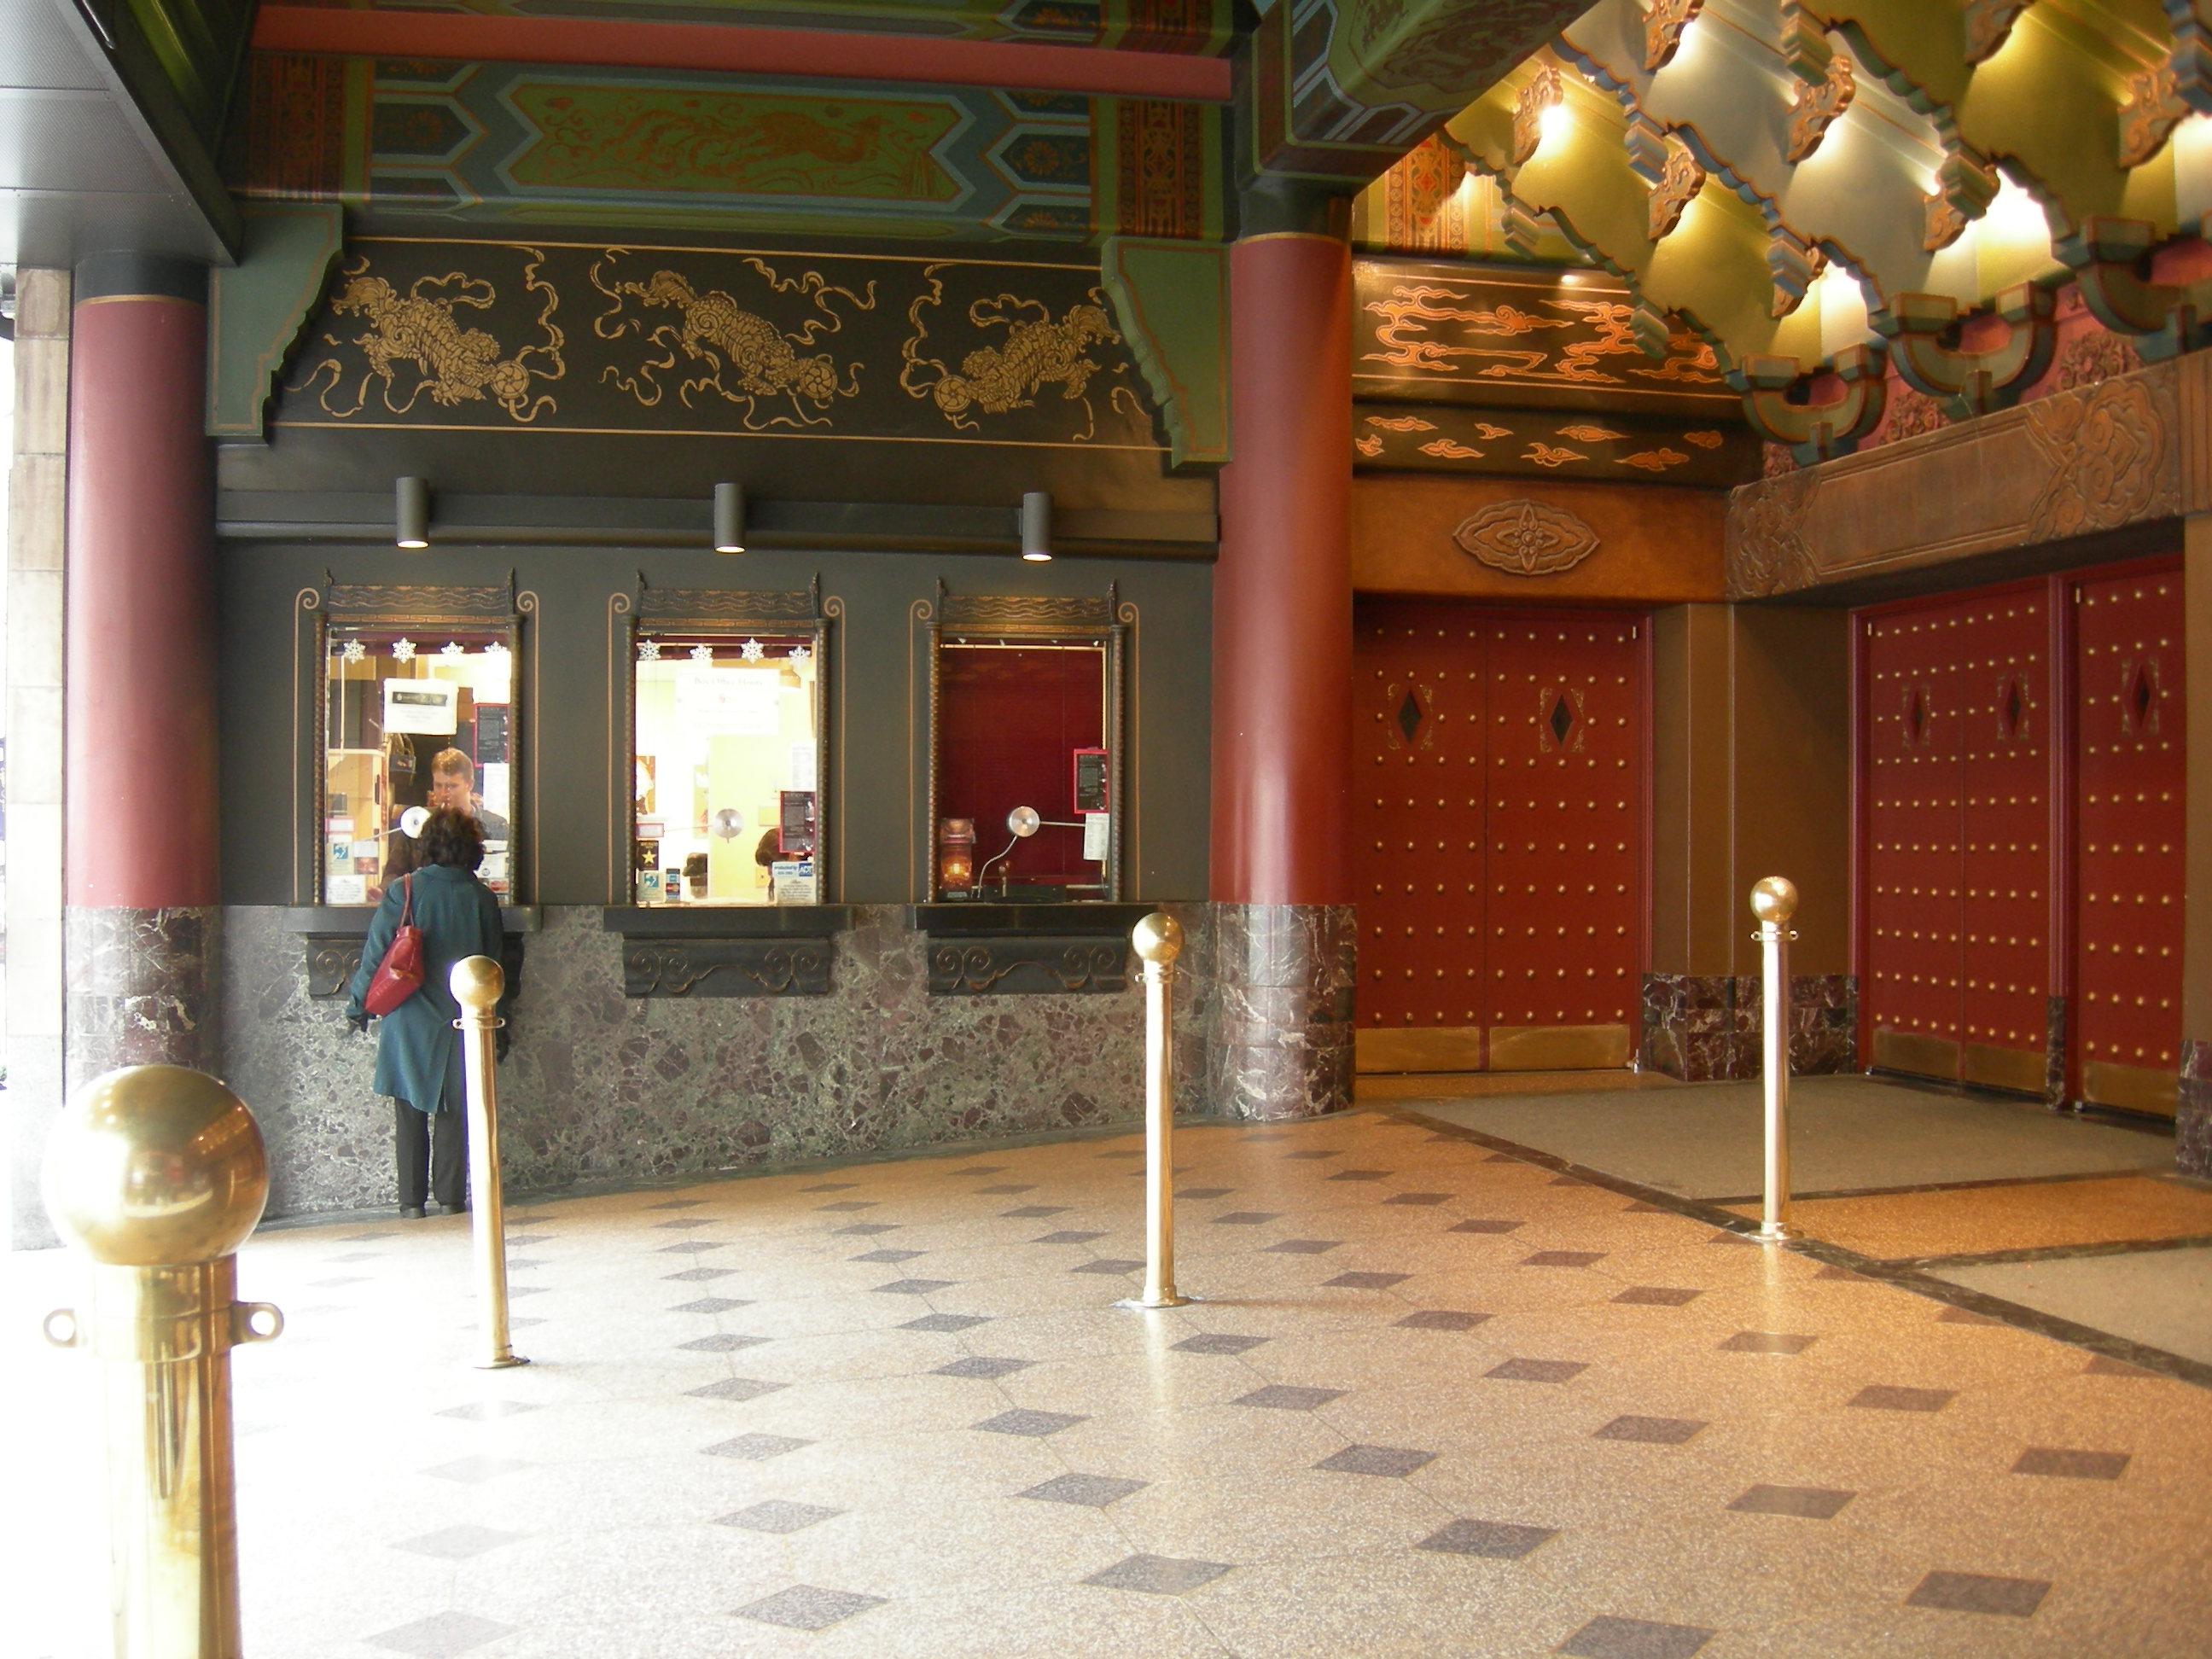 File:Seattle Fifth Avenue Theater 01 jpg - Wikimedia Commons